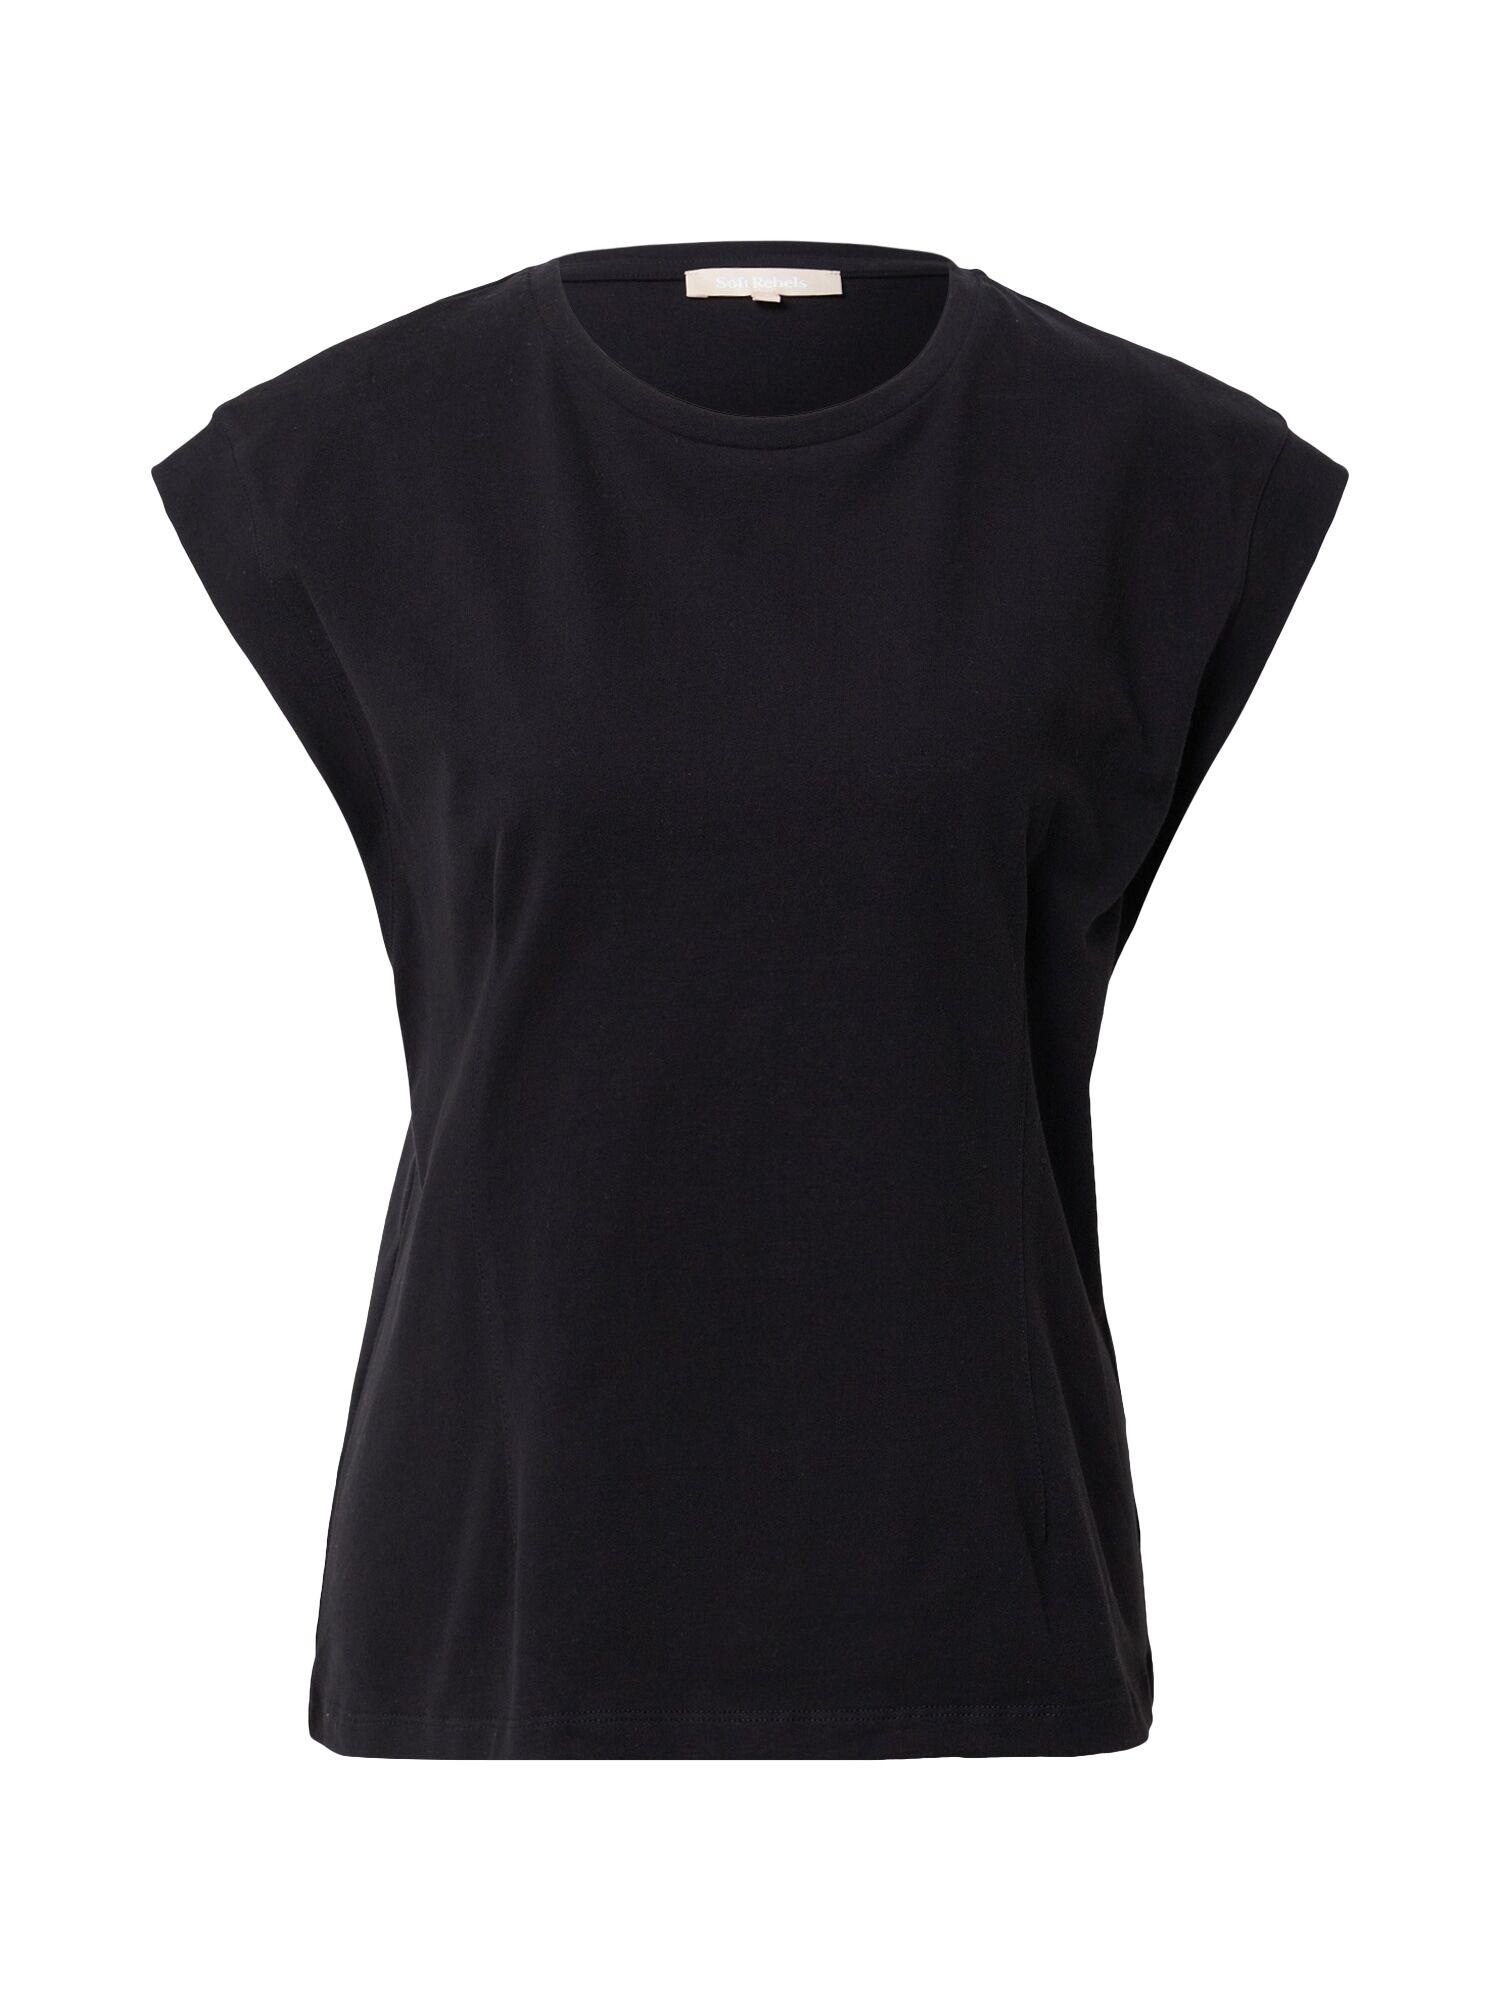 Soft Rebels T-shirt 'Winona'  - Noir - Taille: XS - female